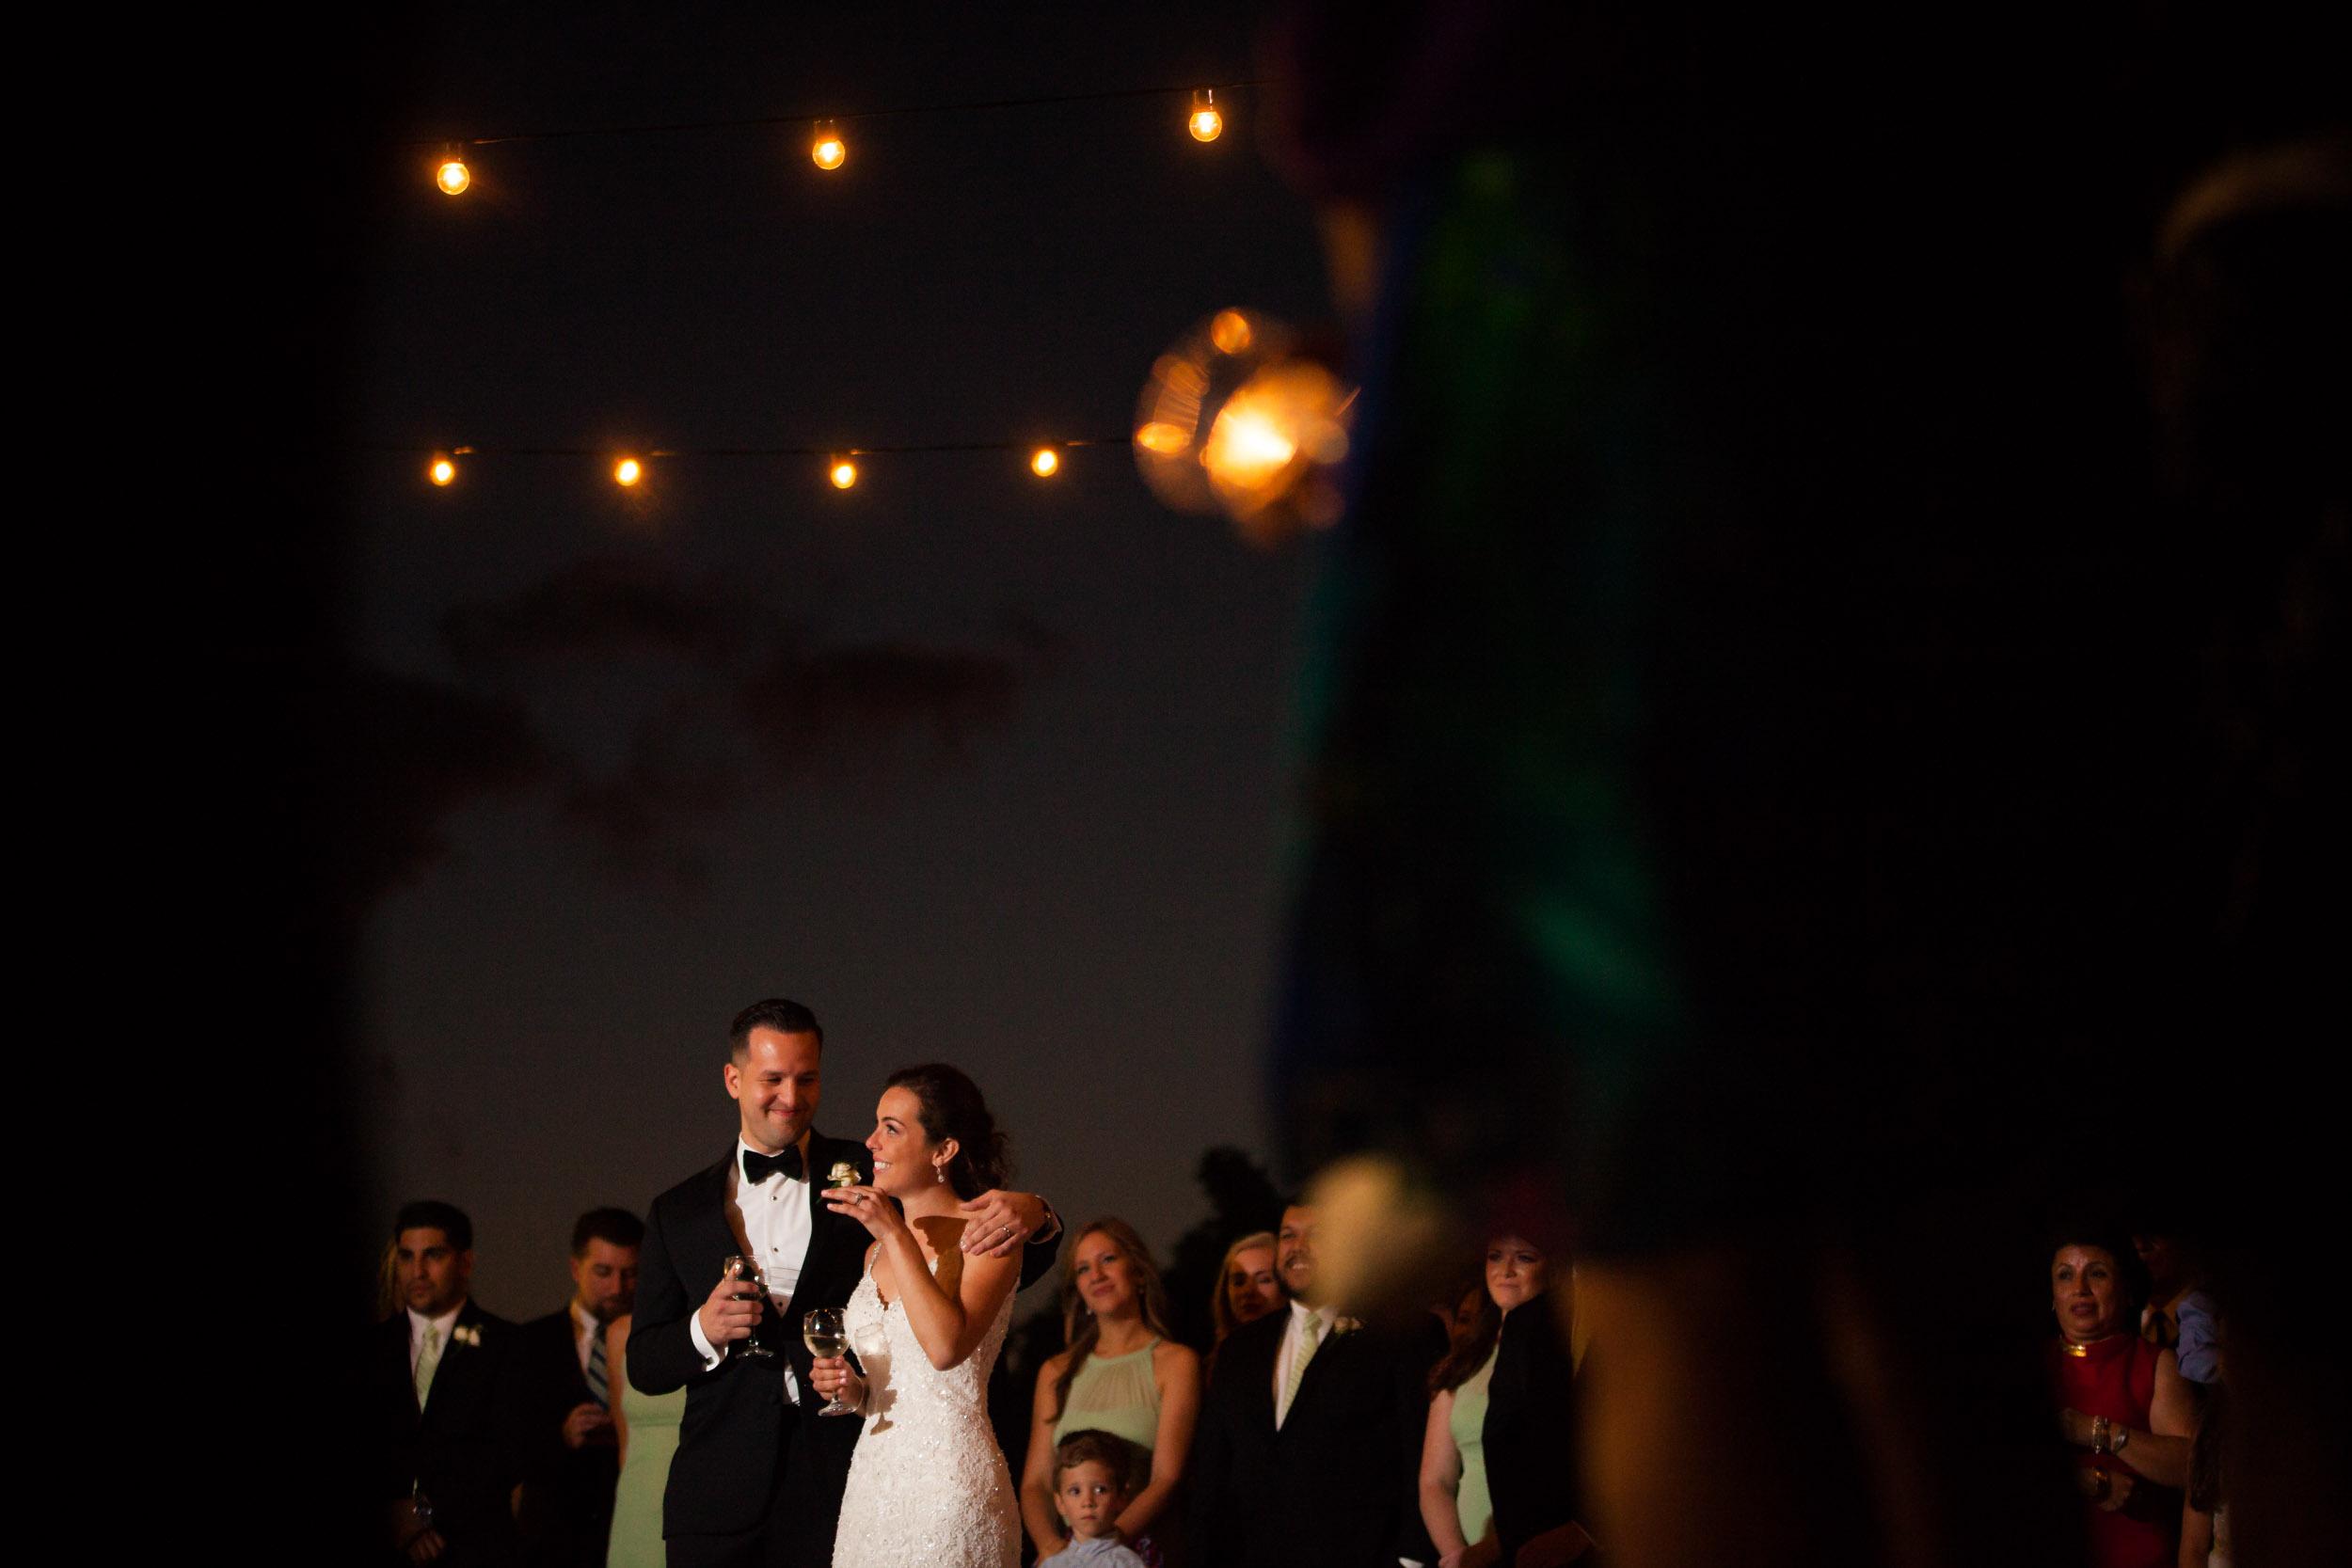 Flordia-Wedding-Photography-67.jpg